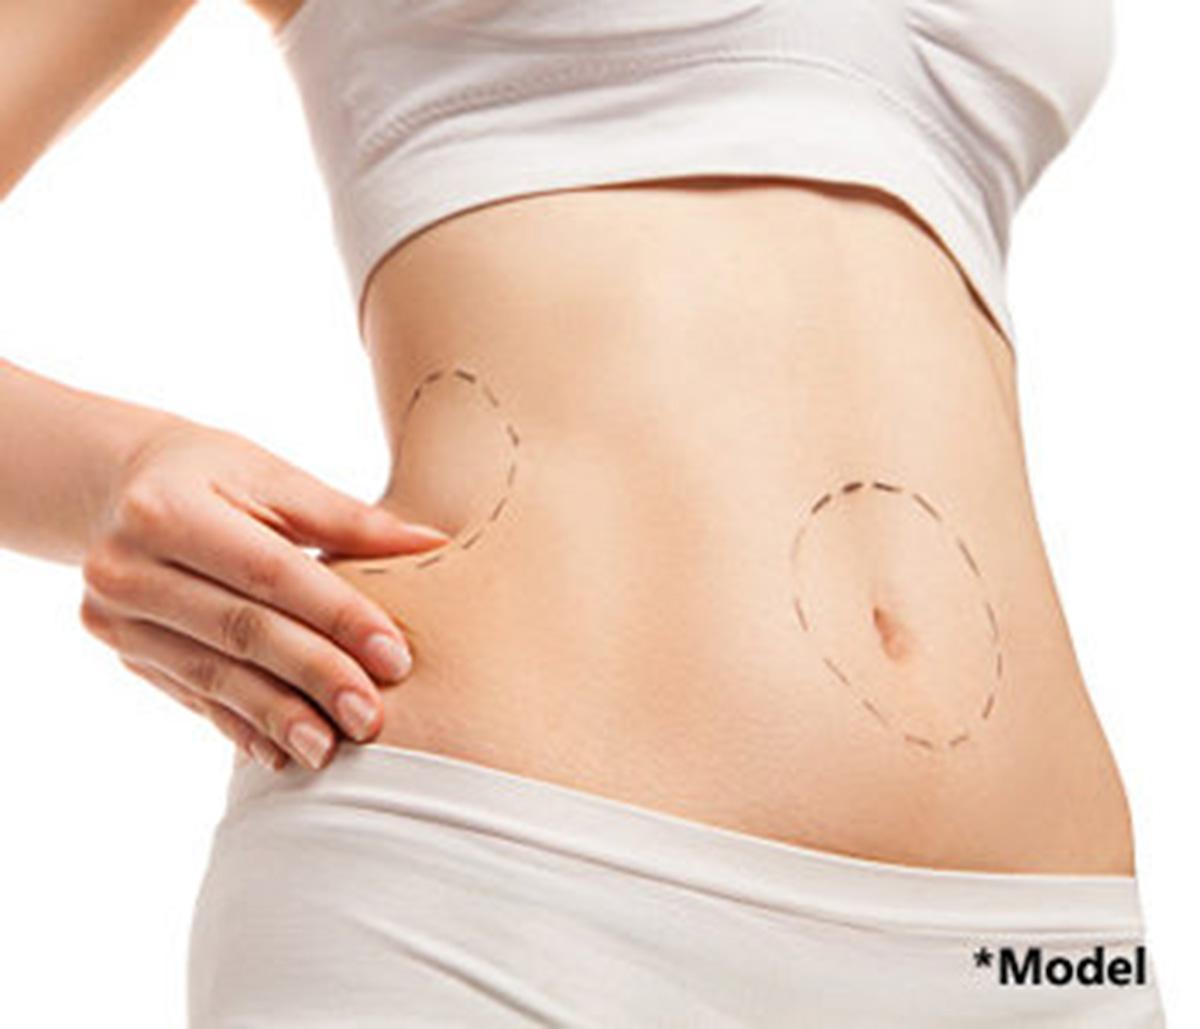 Tummy tuck is a versatile plastic surgery procedure to restore slim contours